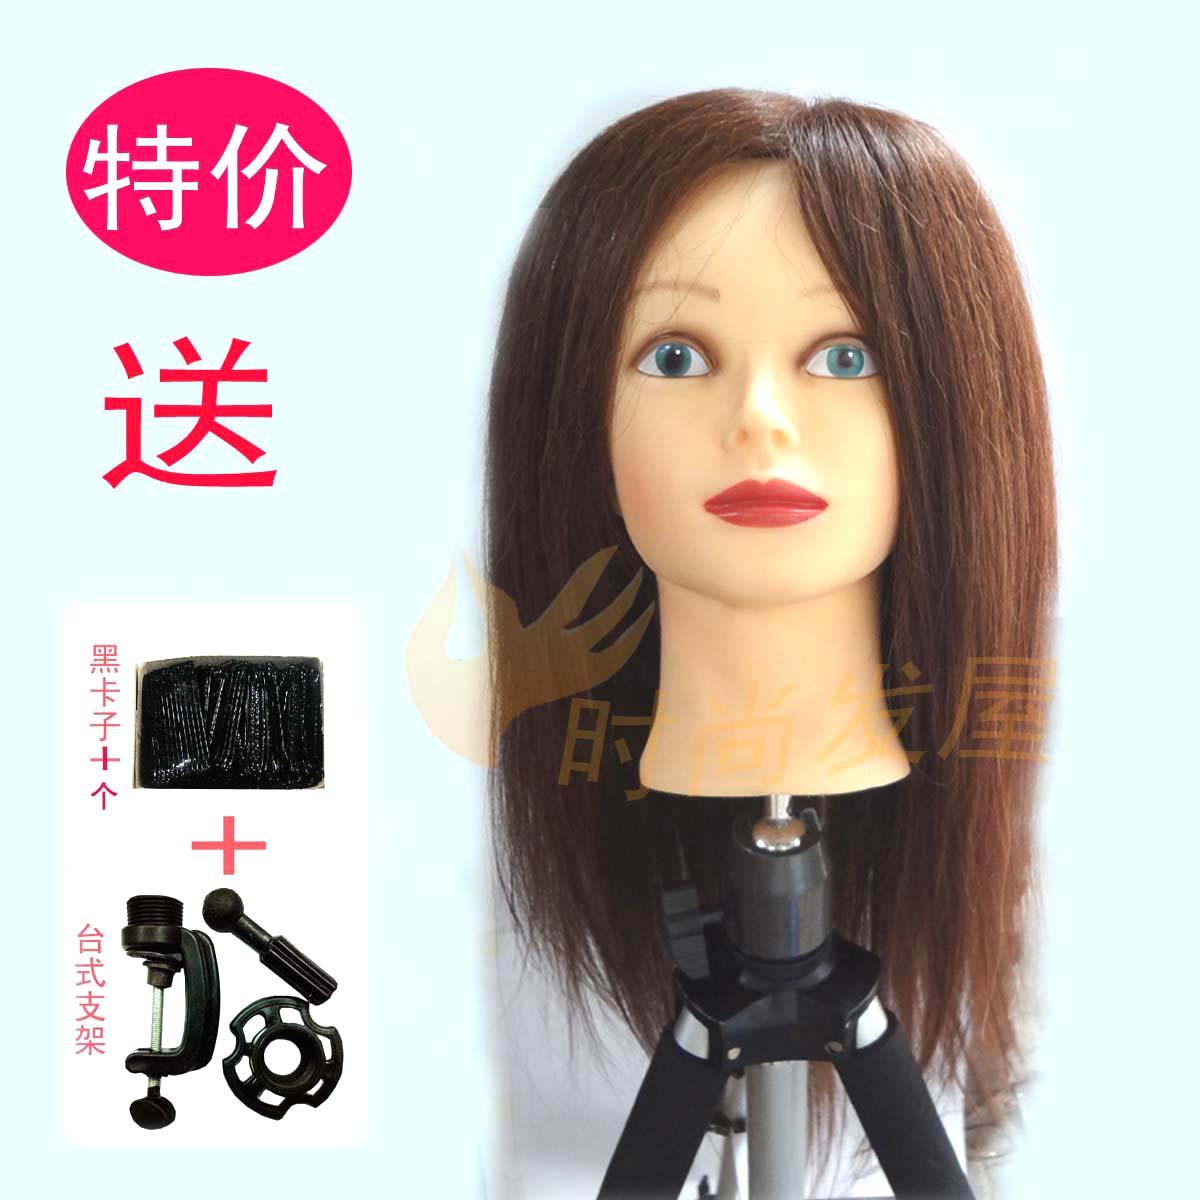 Wholesale price$$ Real hair head model doll headform false head hair curling maker straightener bag horizontal bar(China (Mainland))